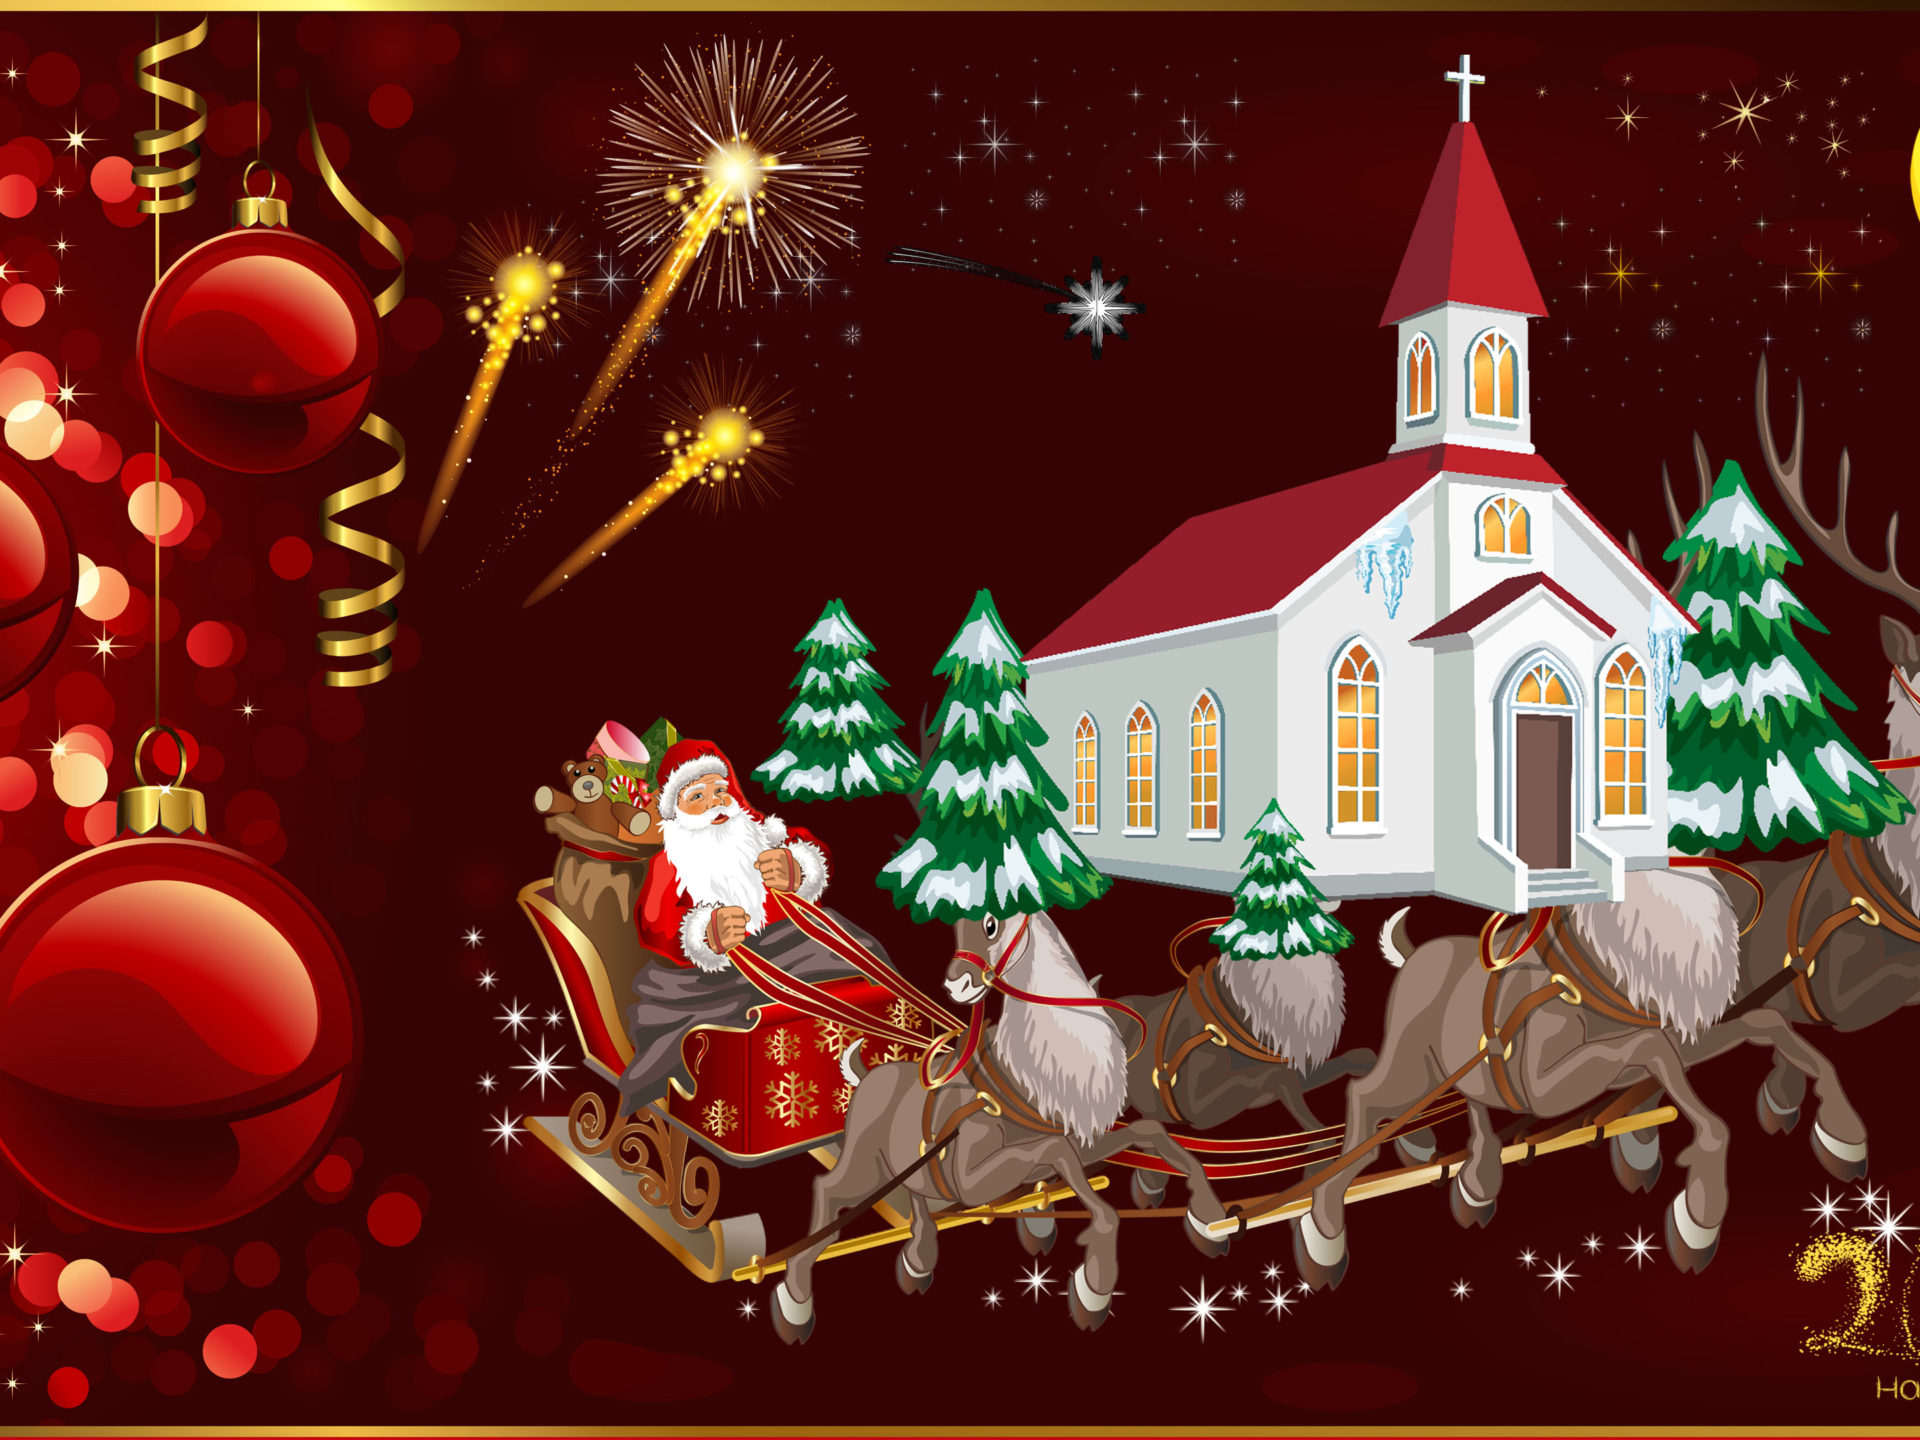 Happy New Year 2020 Merry Christmas Christmas Greeting Card Santa 1920x1440